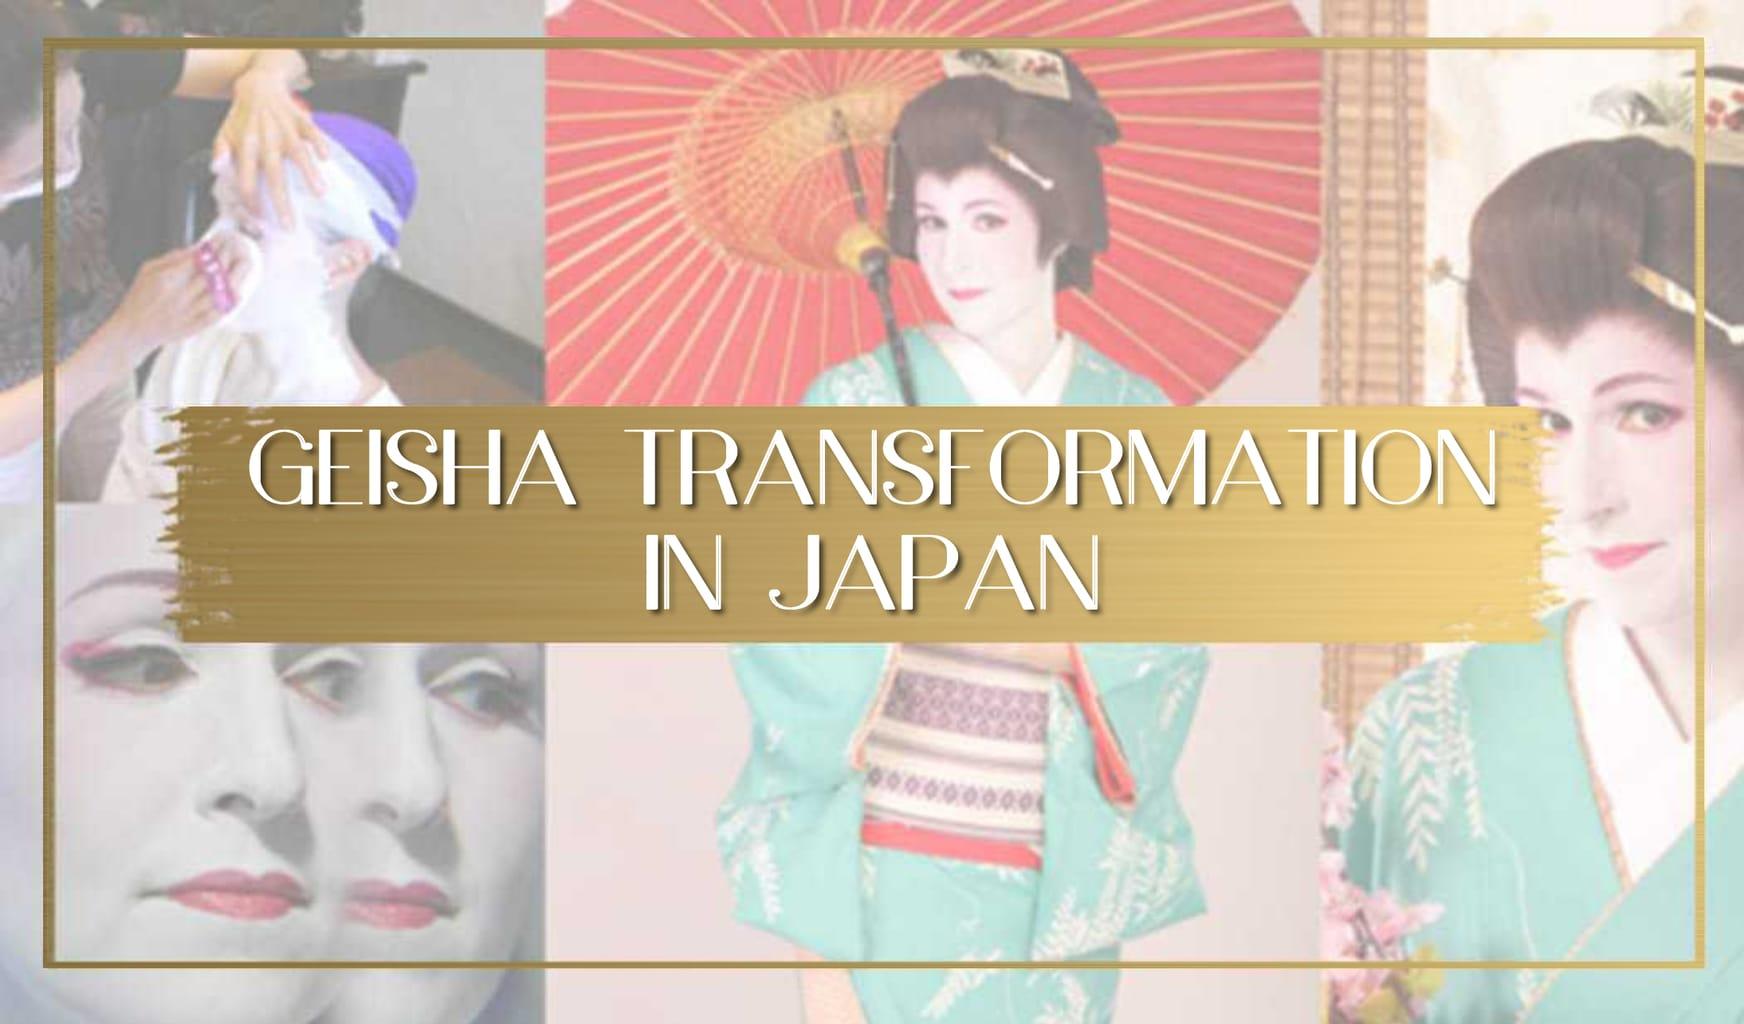 Geisha transformation in Japan main